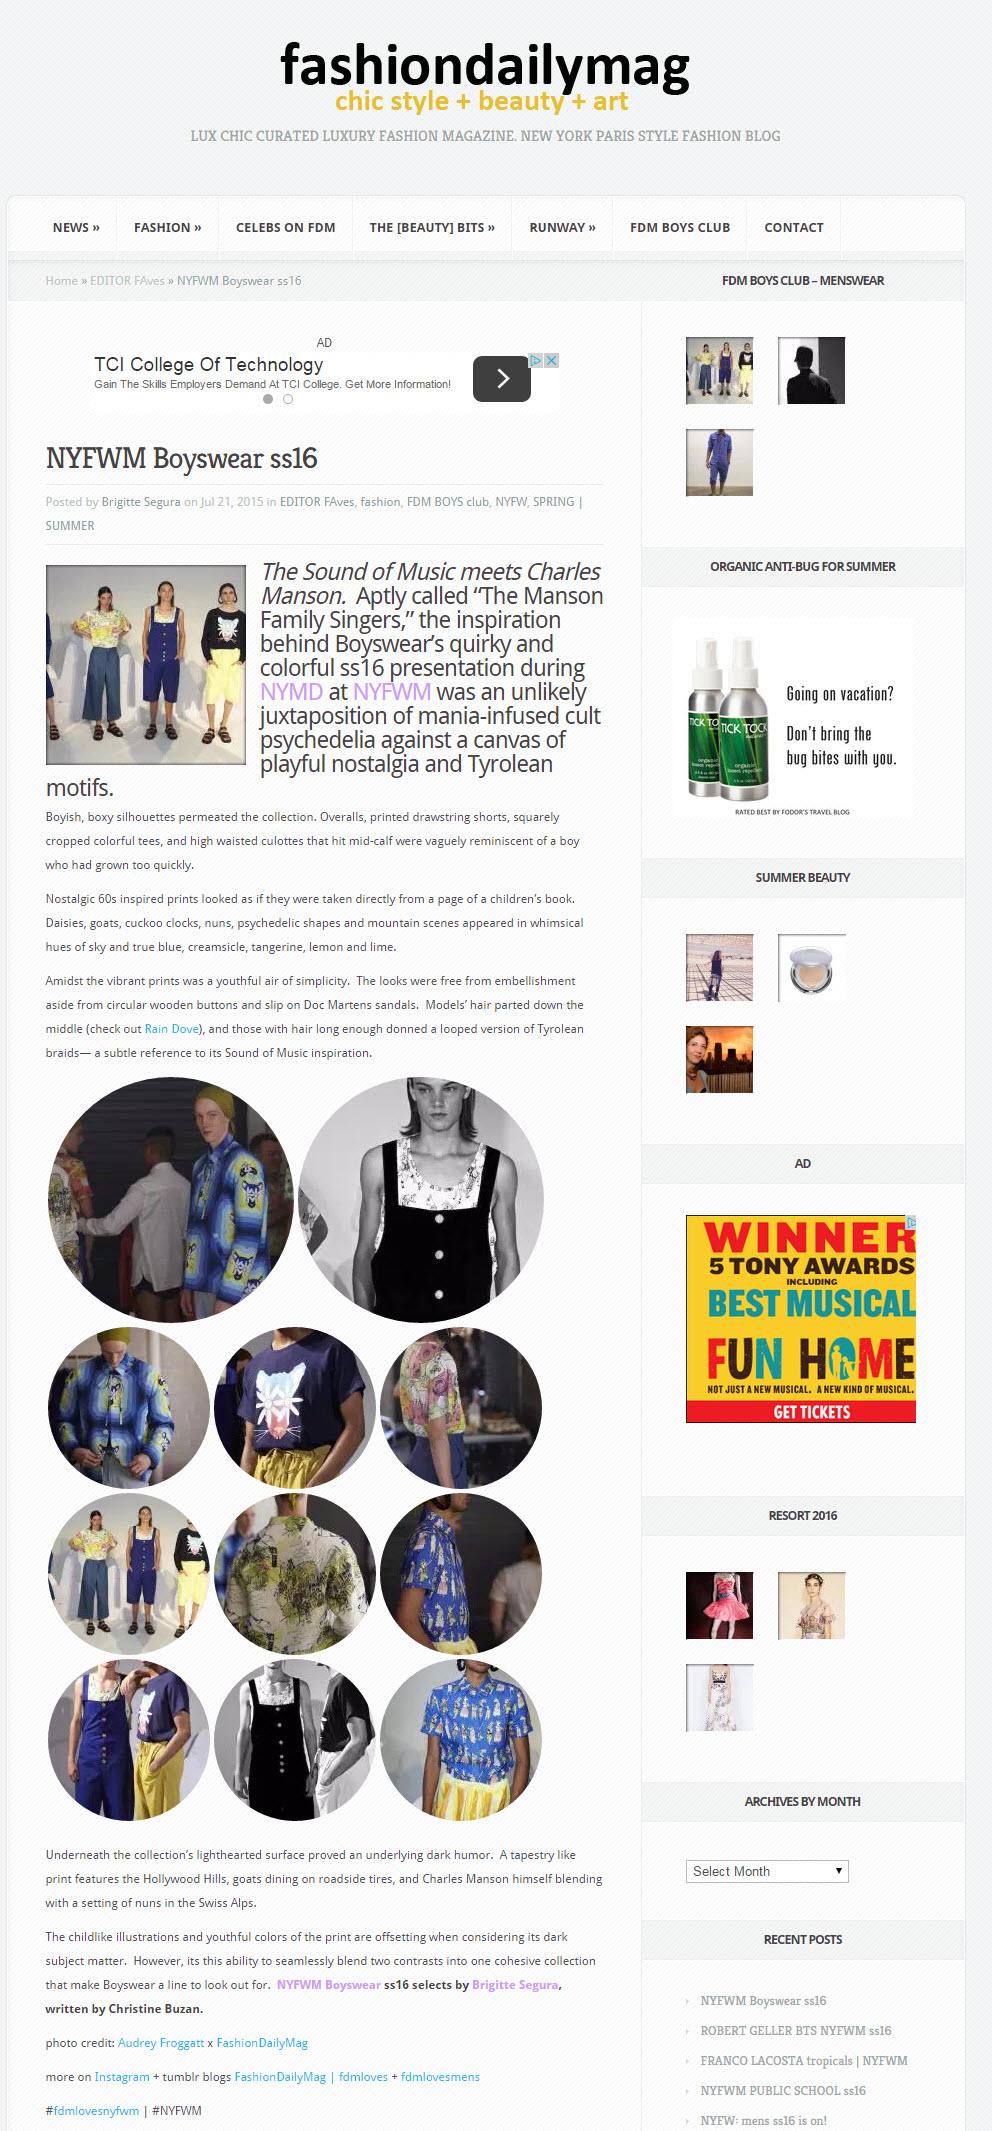 FashionDailyMag.com 7.20.15.jpg